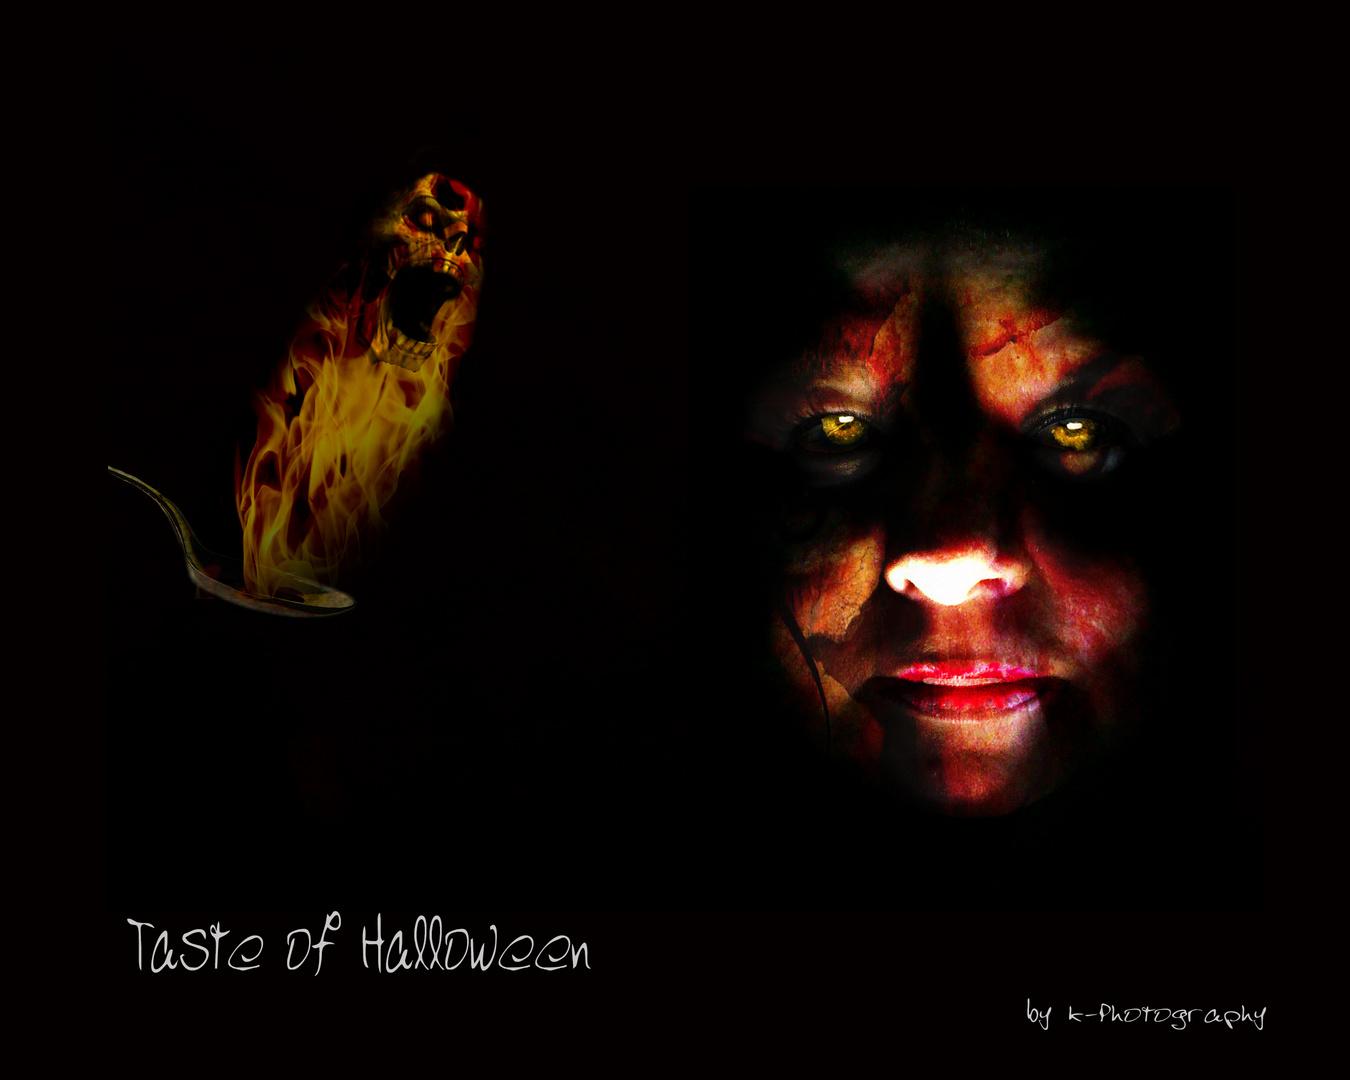 Taste of Halloween